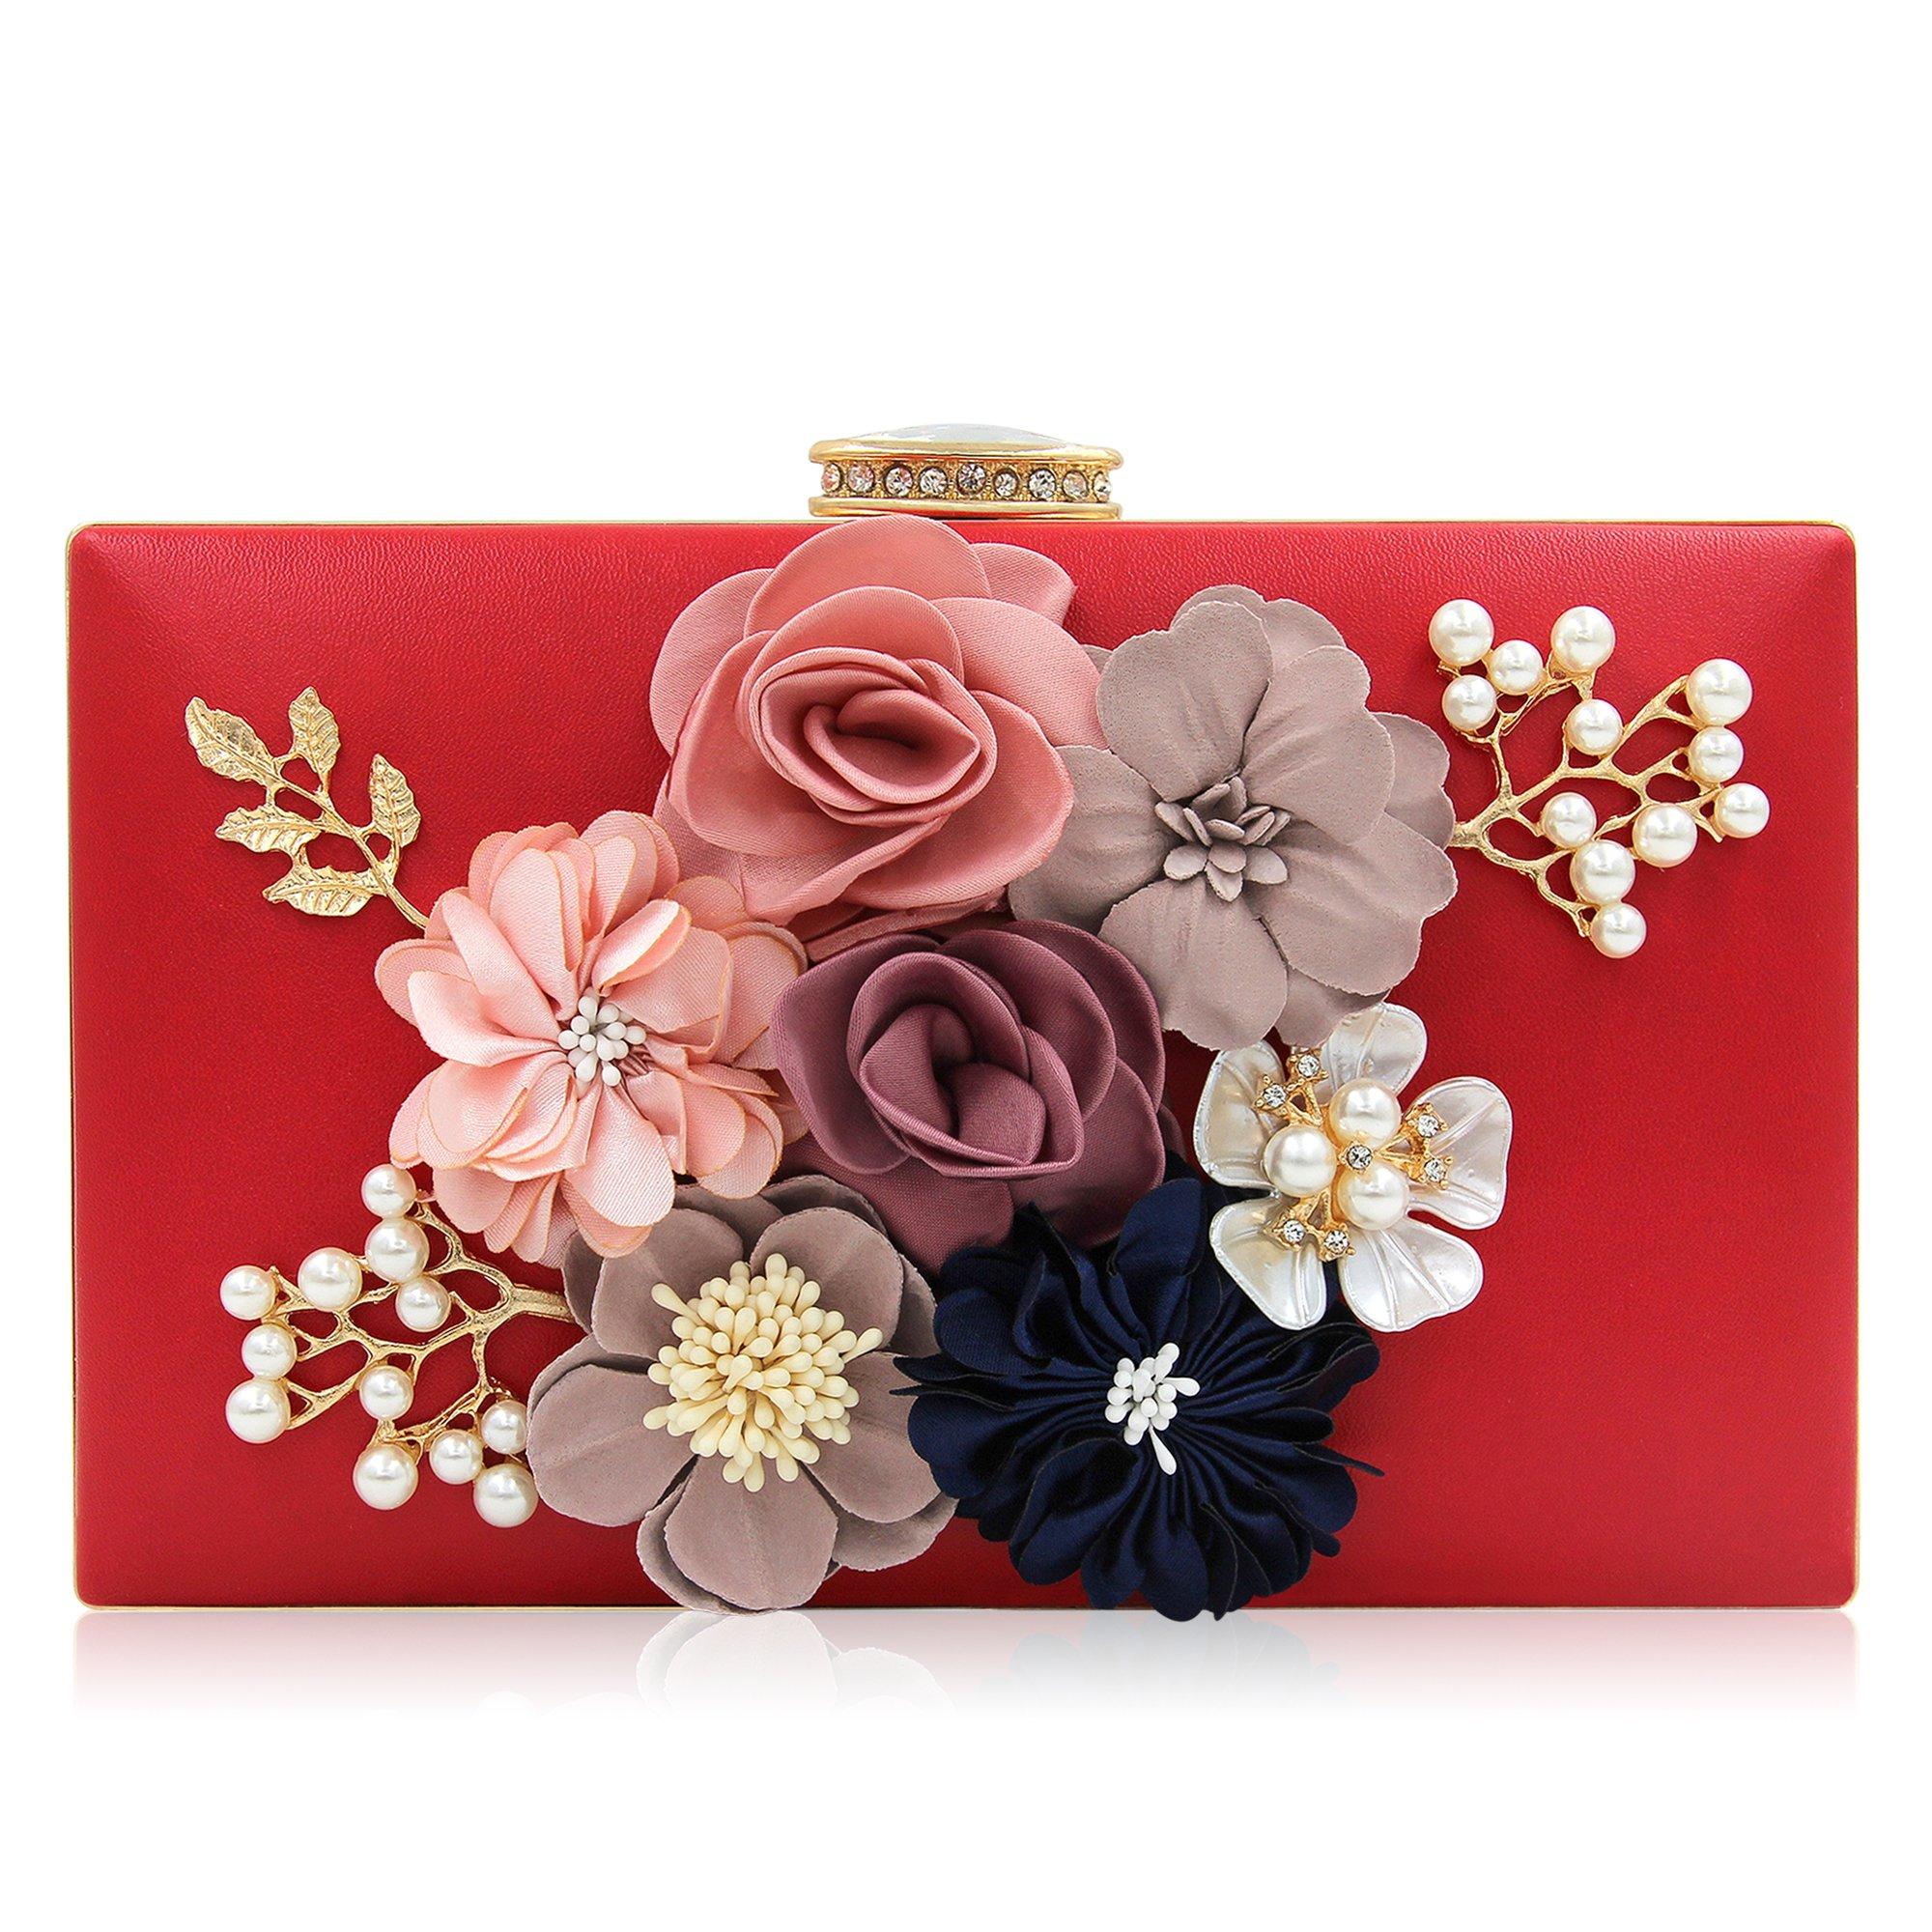 Milisente Flor Bolsa de Noche Mujer Bolso de Boda Elegante Embrague (Rojo) product image